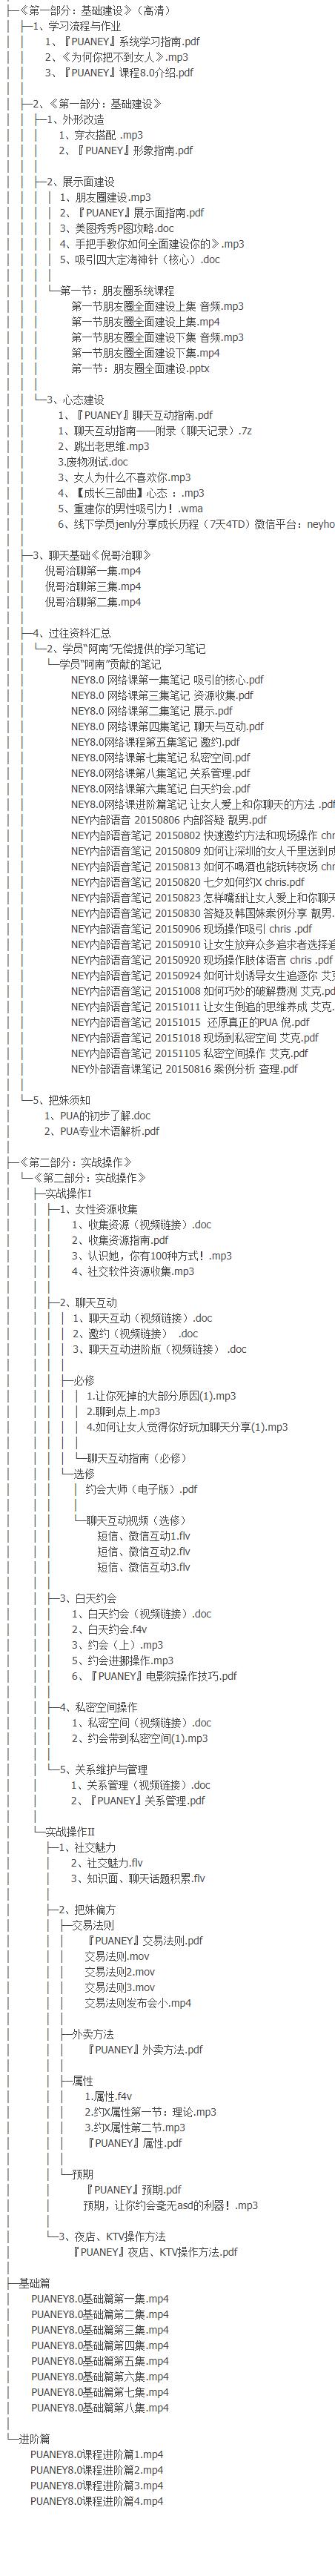 PUAeny8.0(高清)  恋爱技巧 恋爱教学 第2张